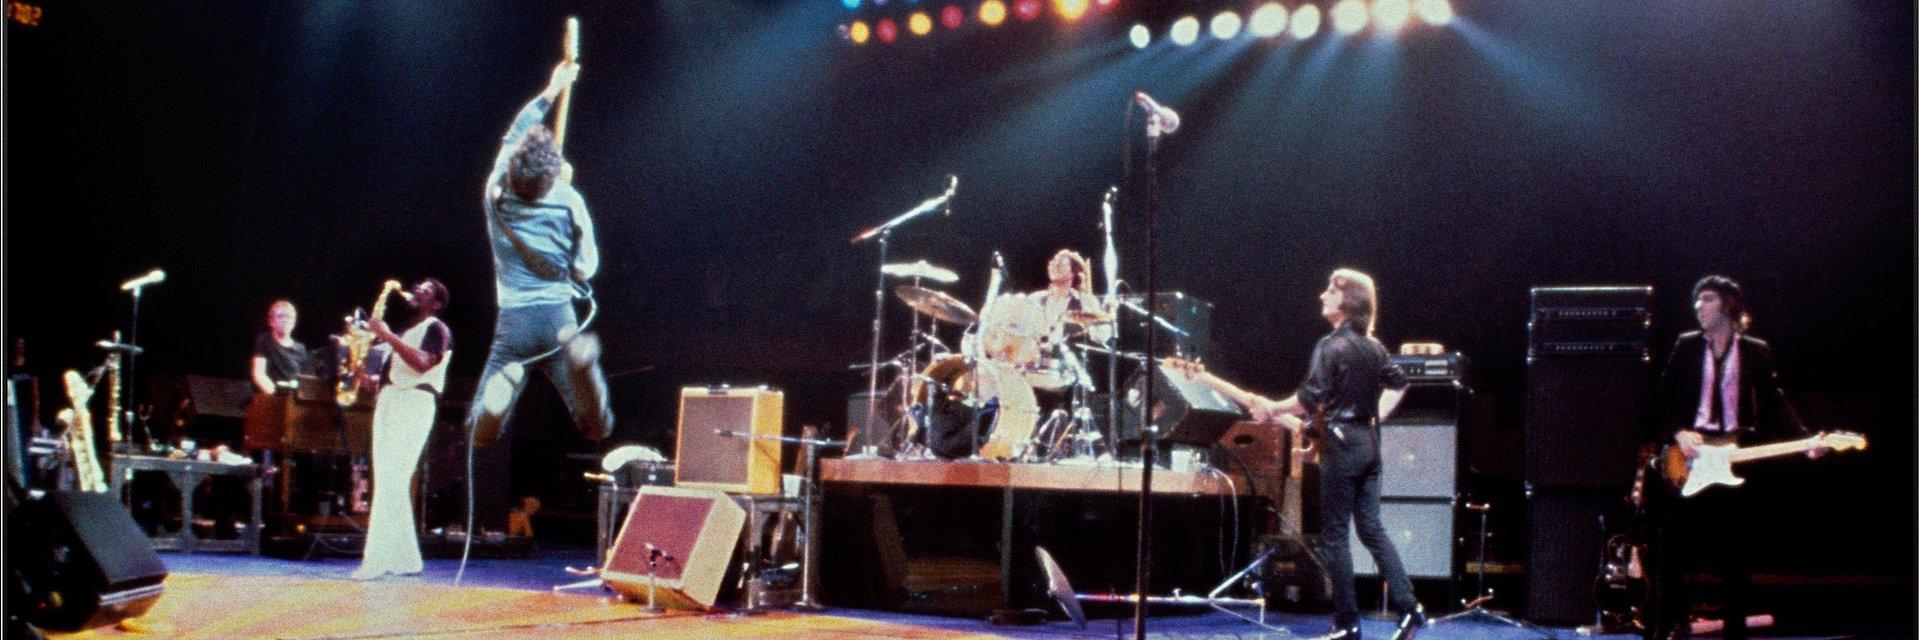 Legendarny koncert Bruce'a Springsteena & The E Street Band już w listopadzie